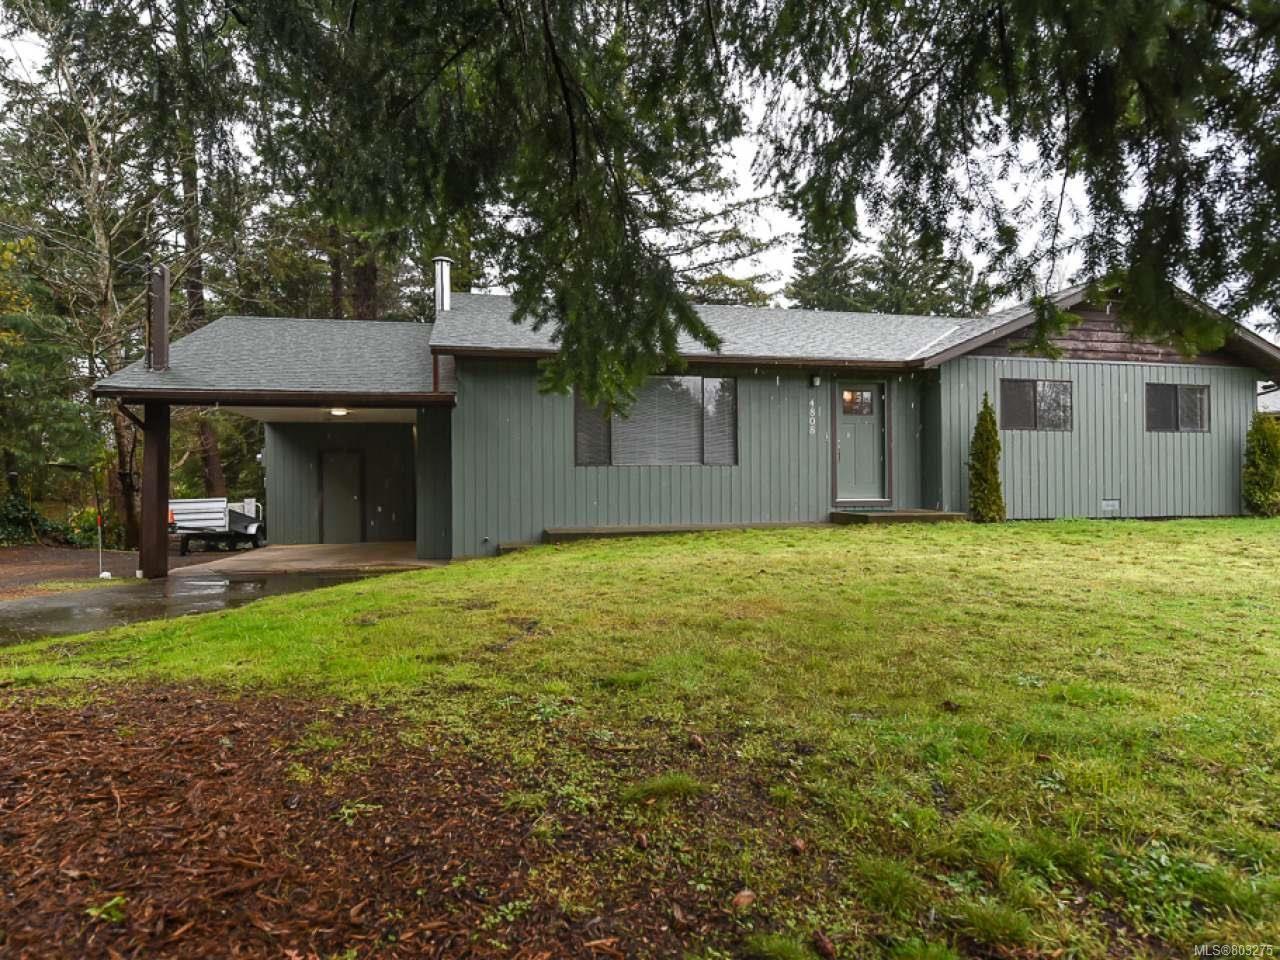 Main Photo: 4808 Alton Pl in COURTENAY: CV Courtenay East House for sale (Comox Valley)  : MLS®# 803275